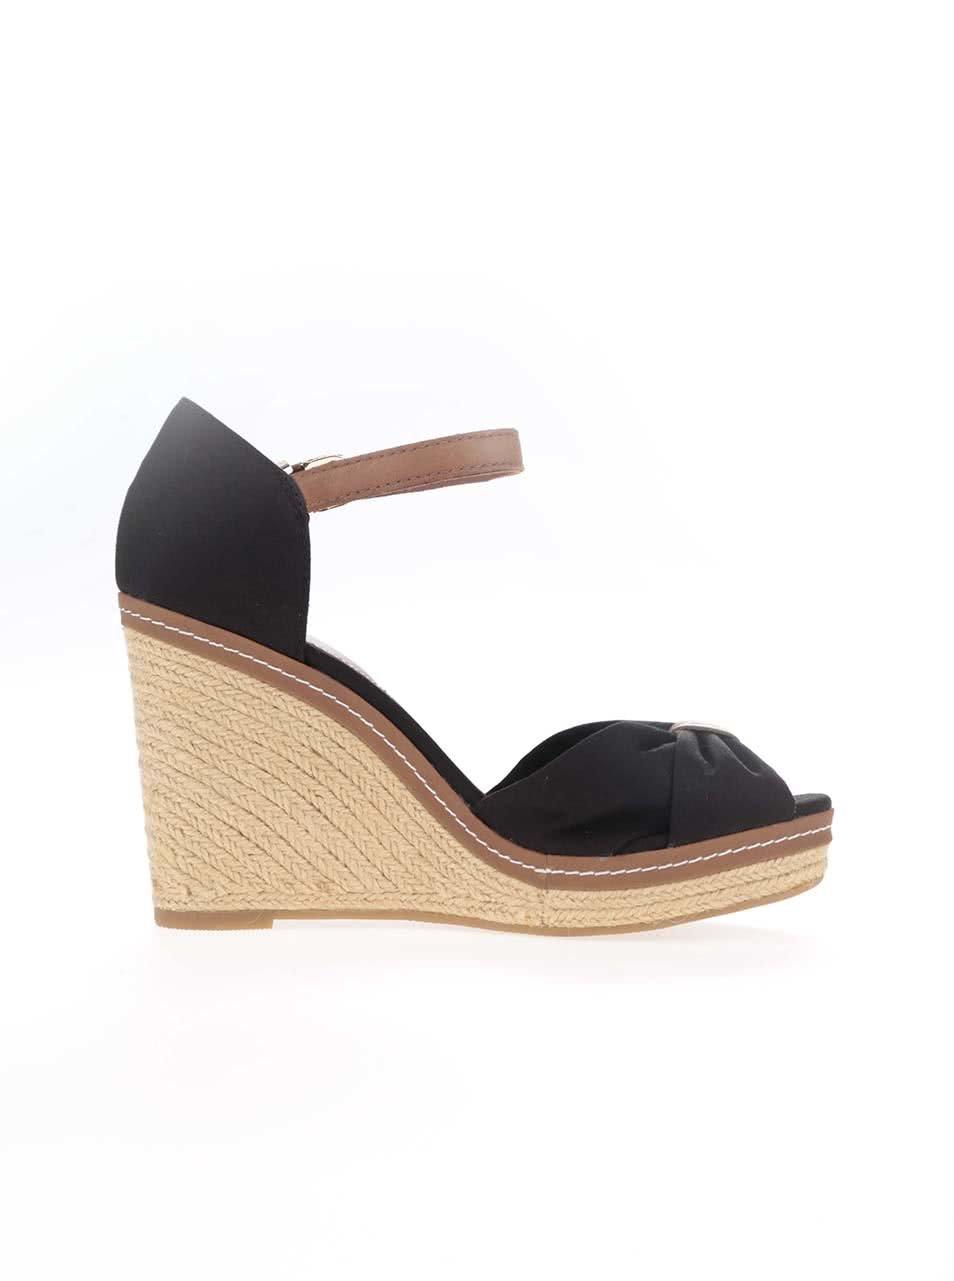 ab53d4b85c Čierne dámske topánky na platforme Tommy Hilfiger ...